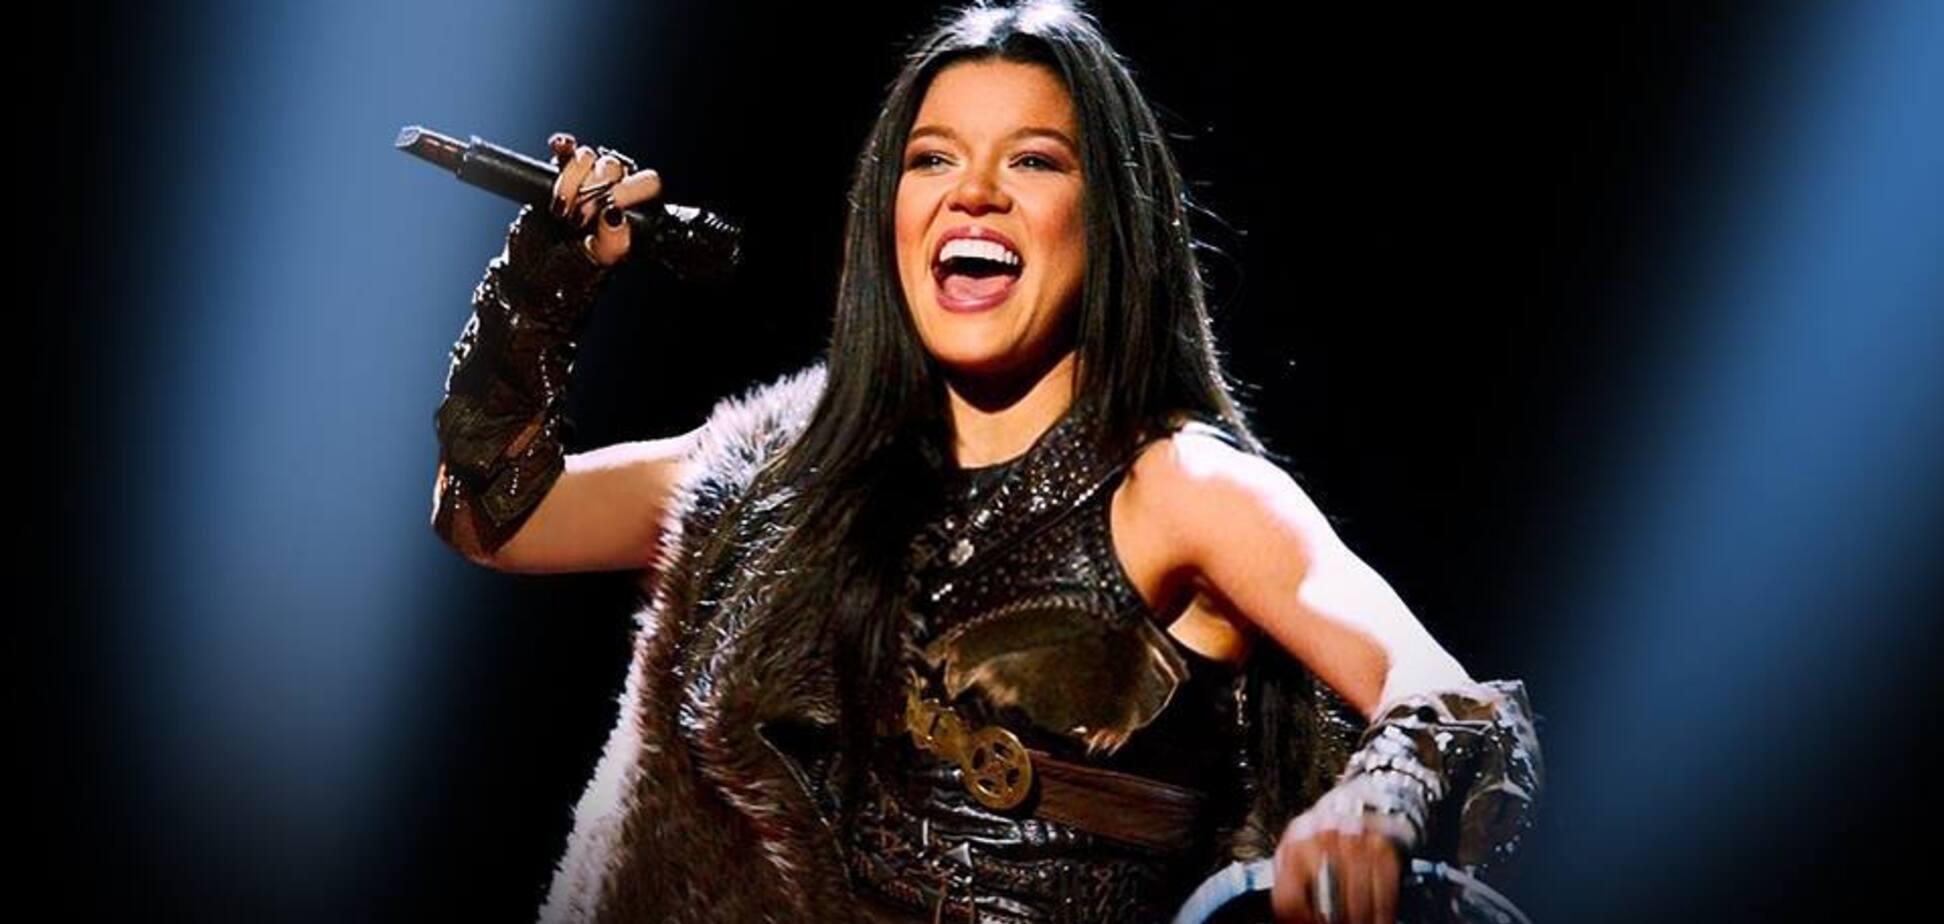 Победительница Евровидения жестко ответила на скандал с MARUV